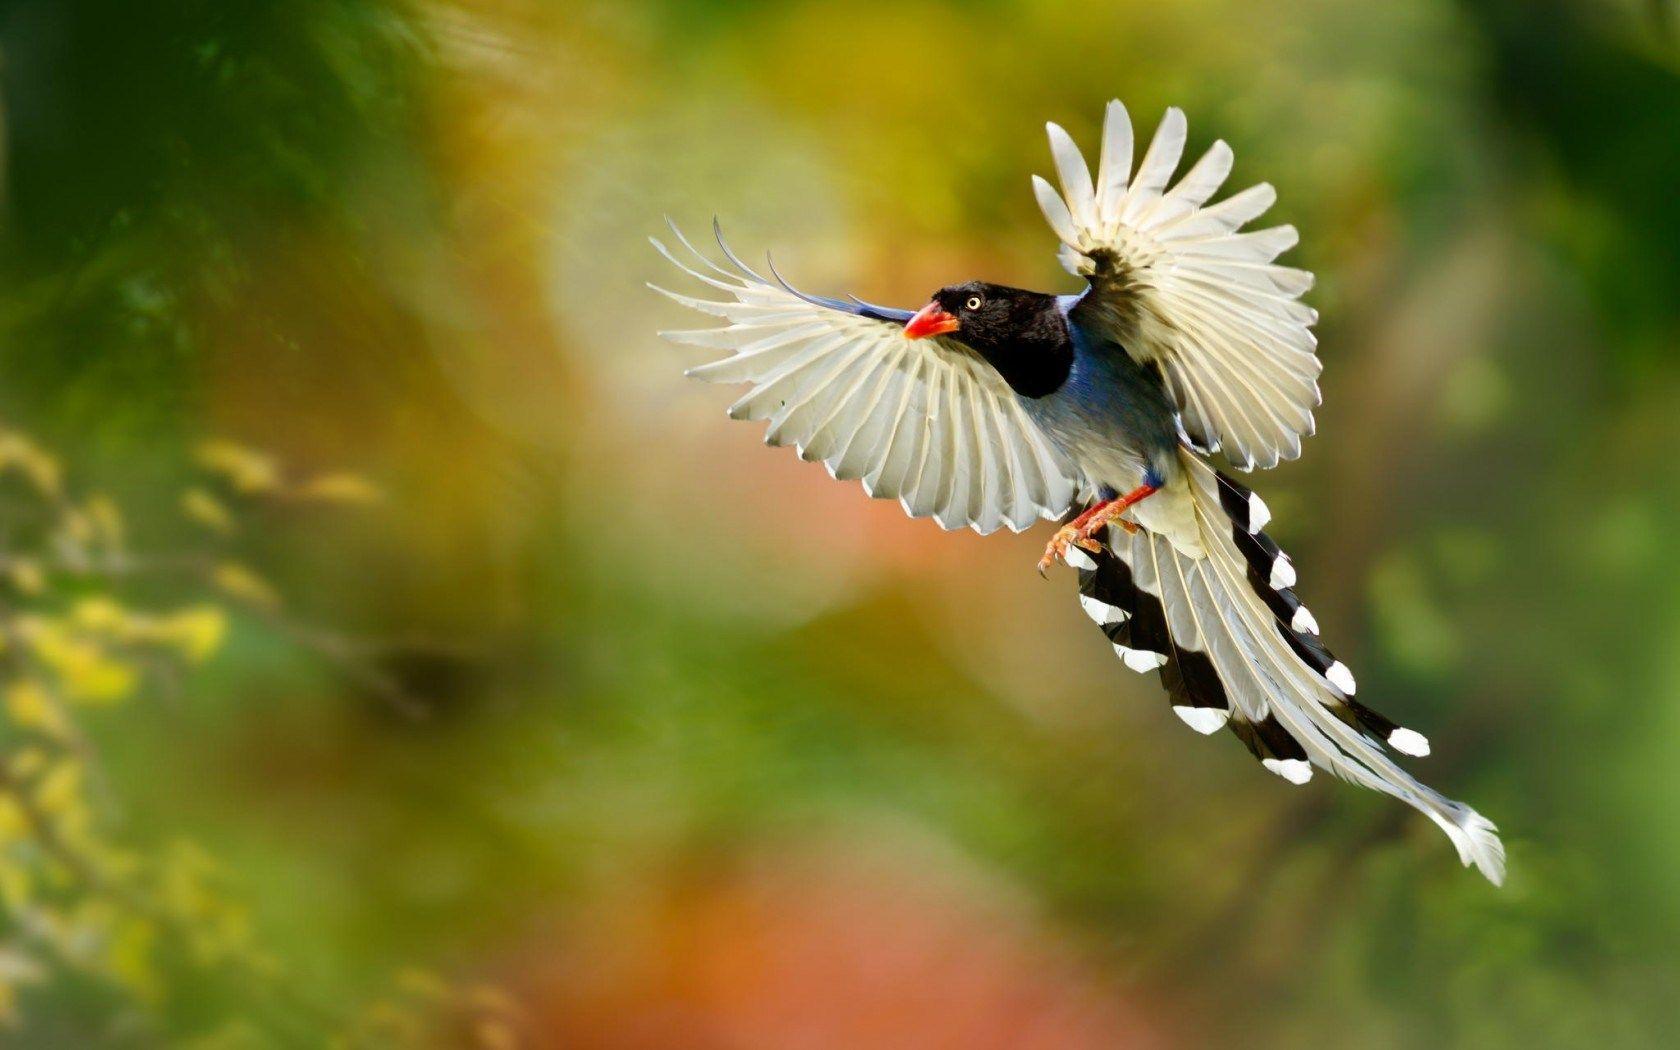 beautiful-bird-wings-hd-wallpaper | nature inspires: birds